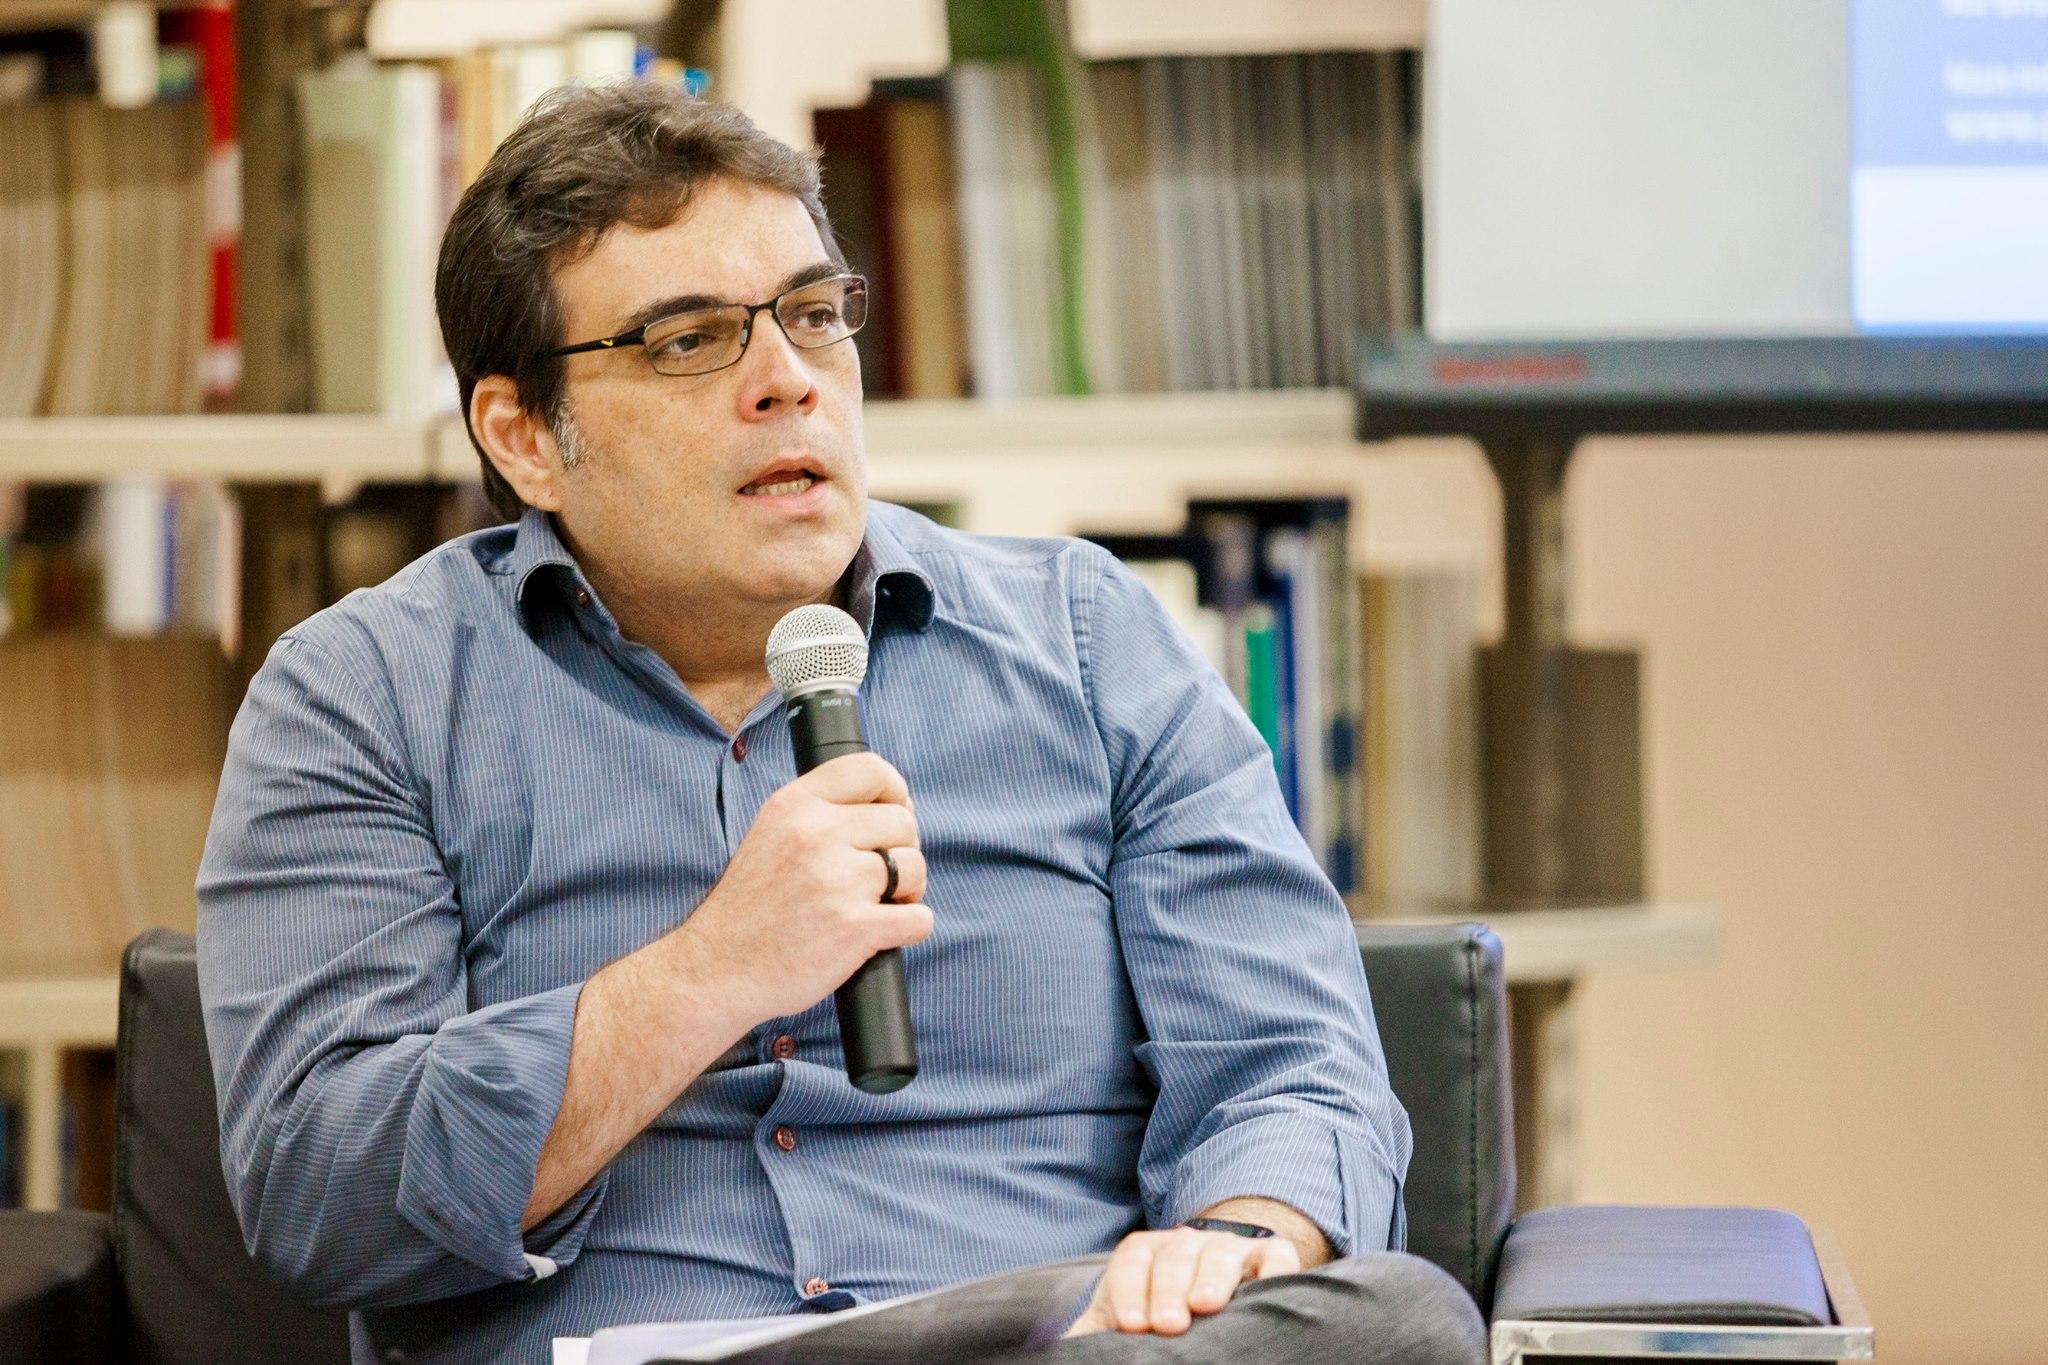 Rodrigo Murtinho